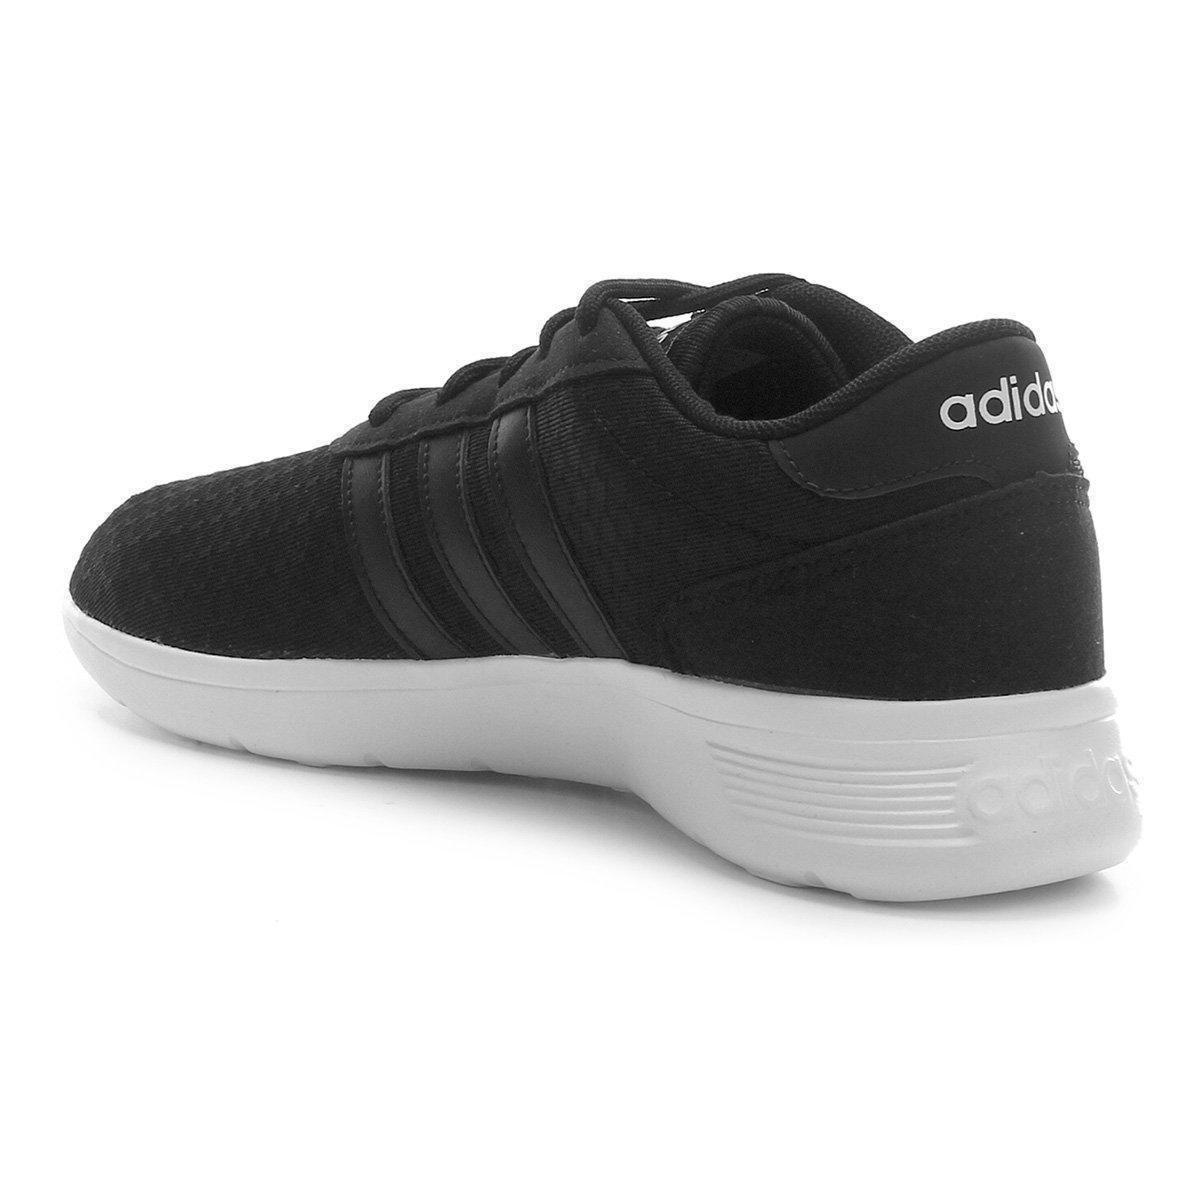 Tênis Adidas Lite Racer Masculino - Tam: 37 - 1